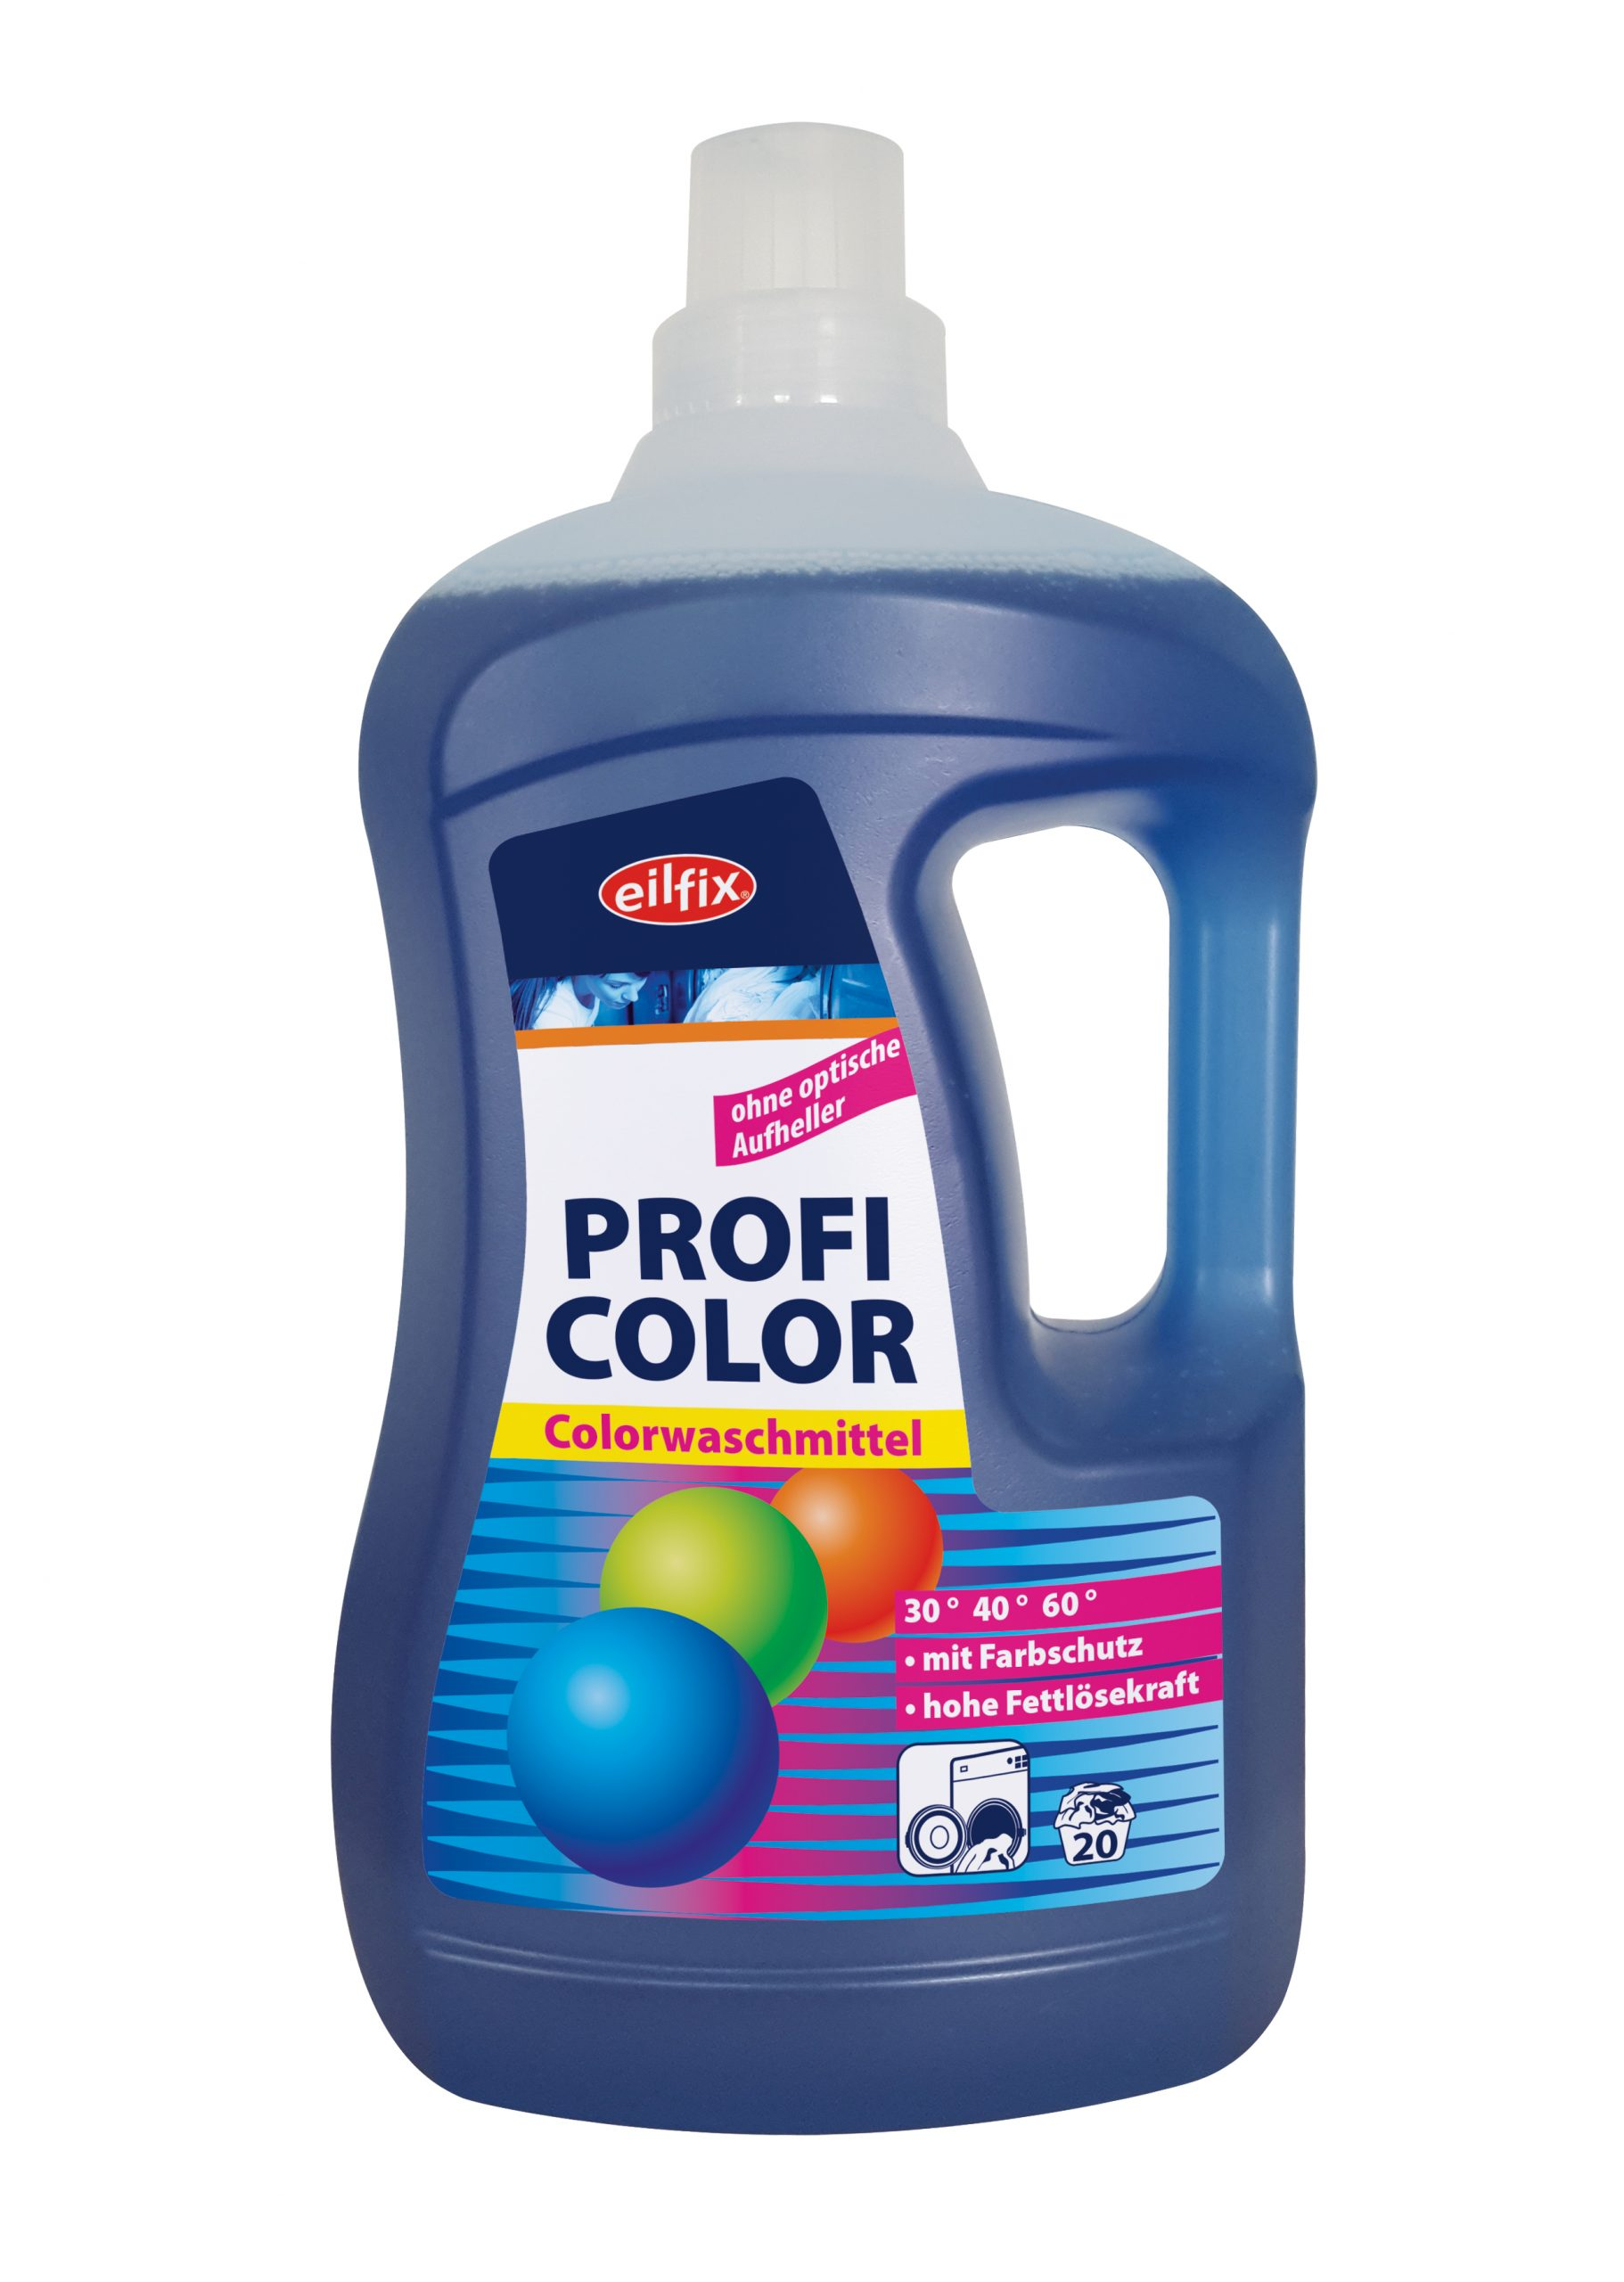 Profi Color